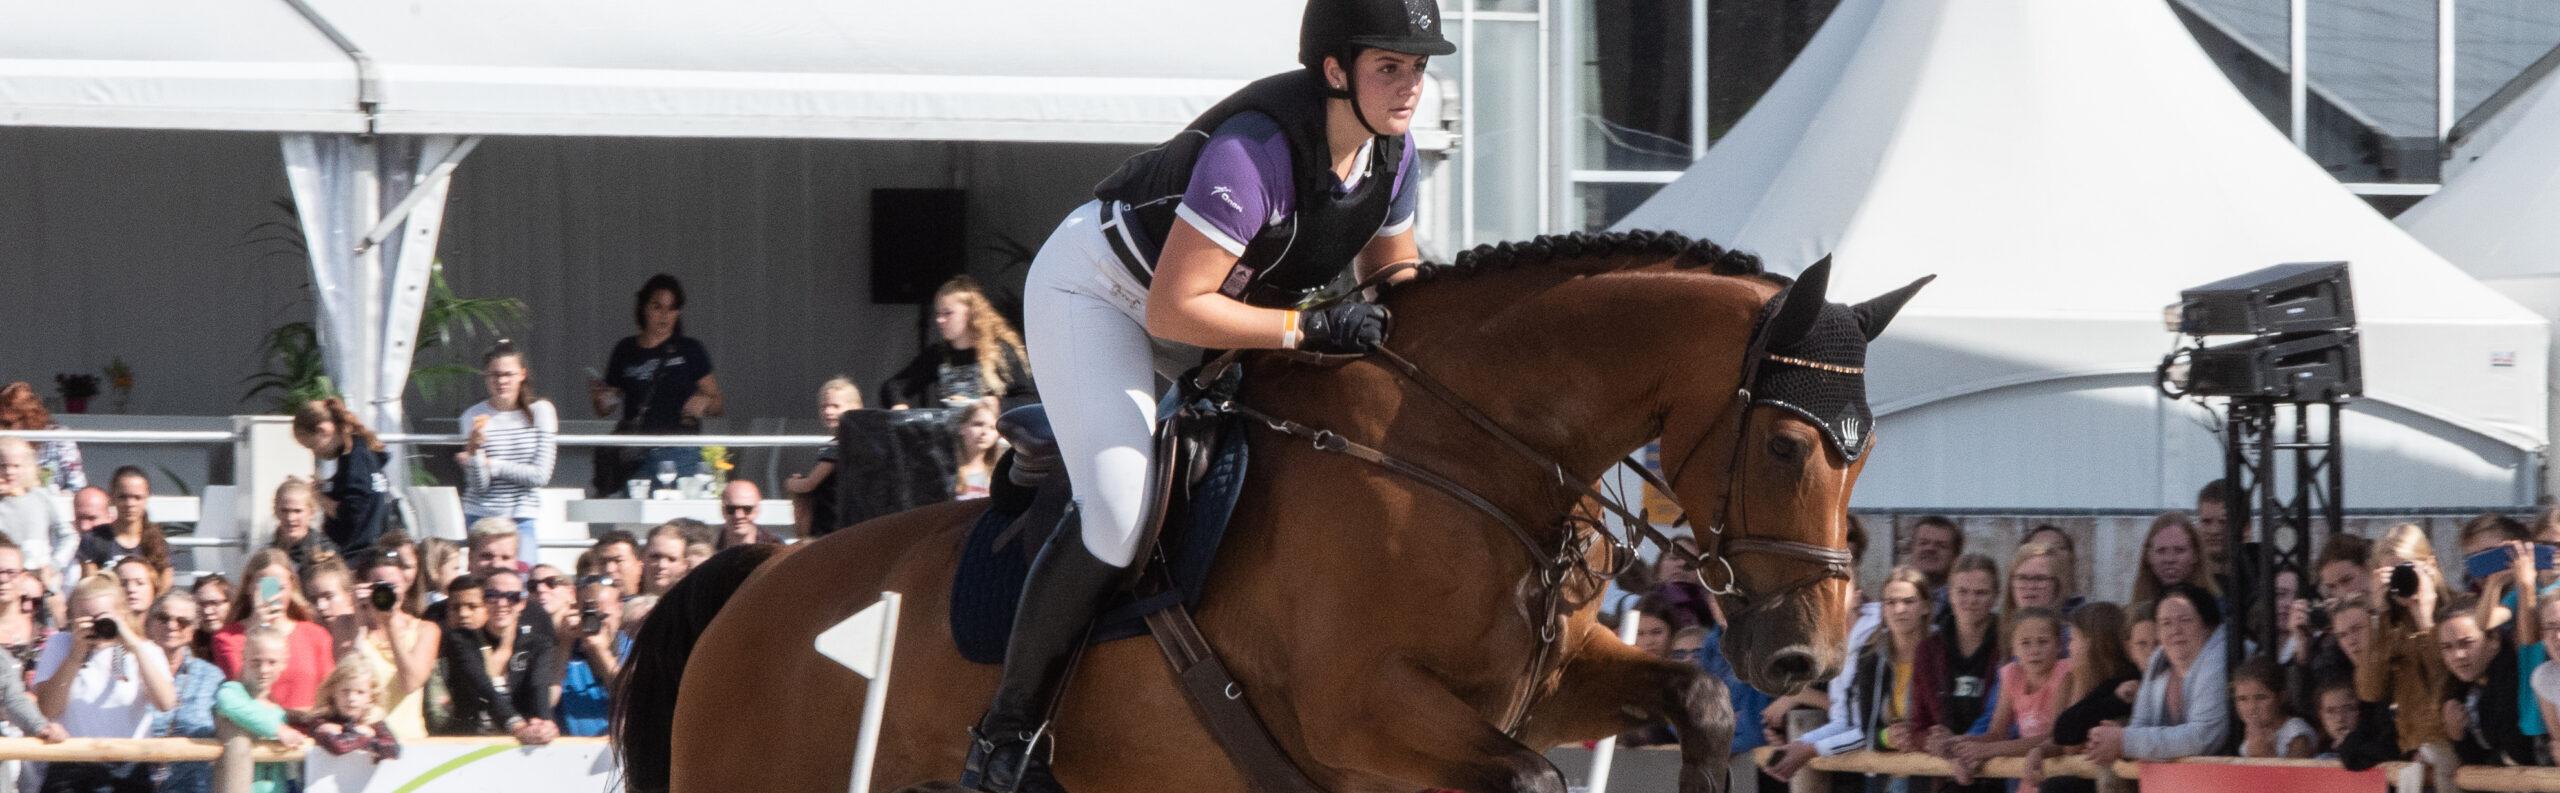 Hunter Equitation (10)